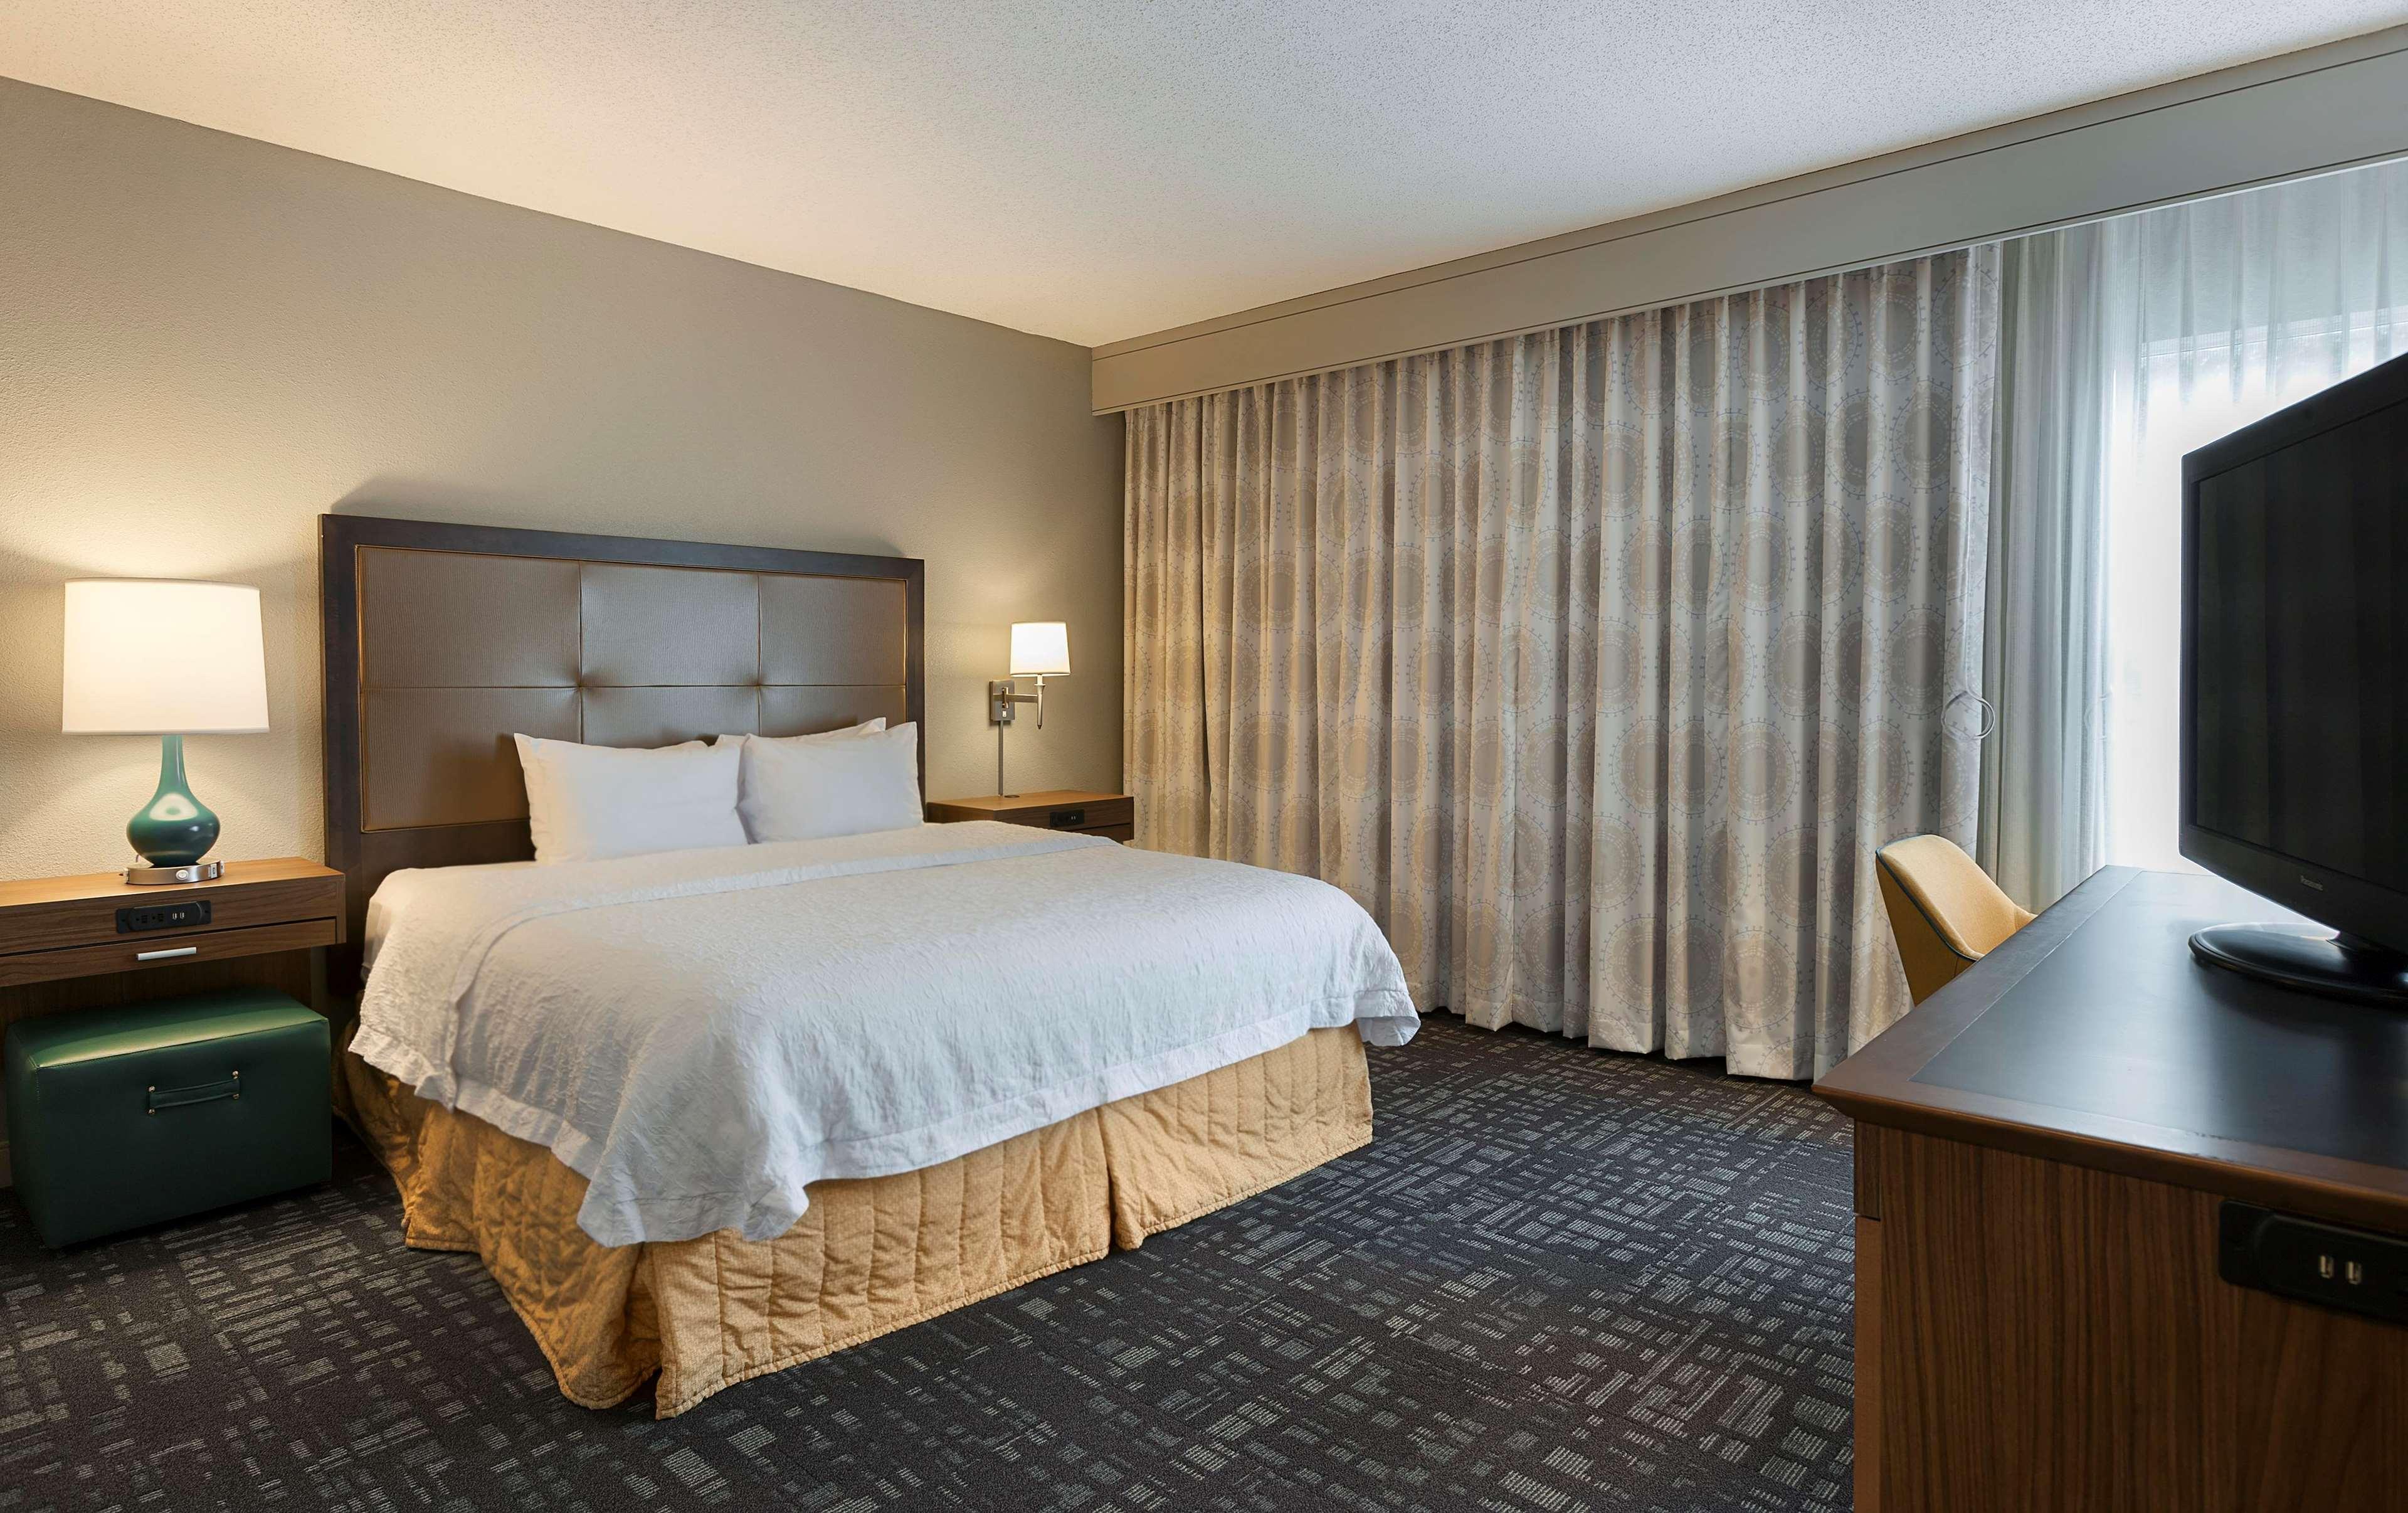 Hampton Inn & Suites Charlotte/Pineville image 27